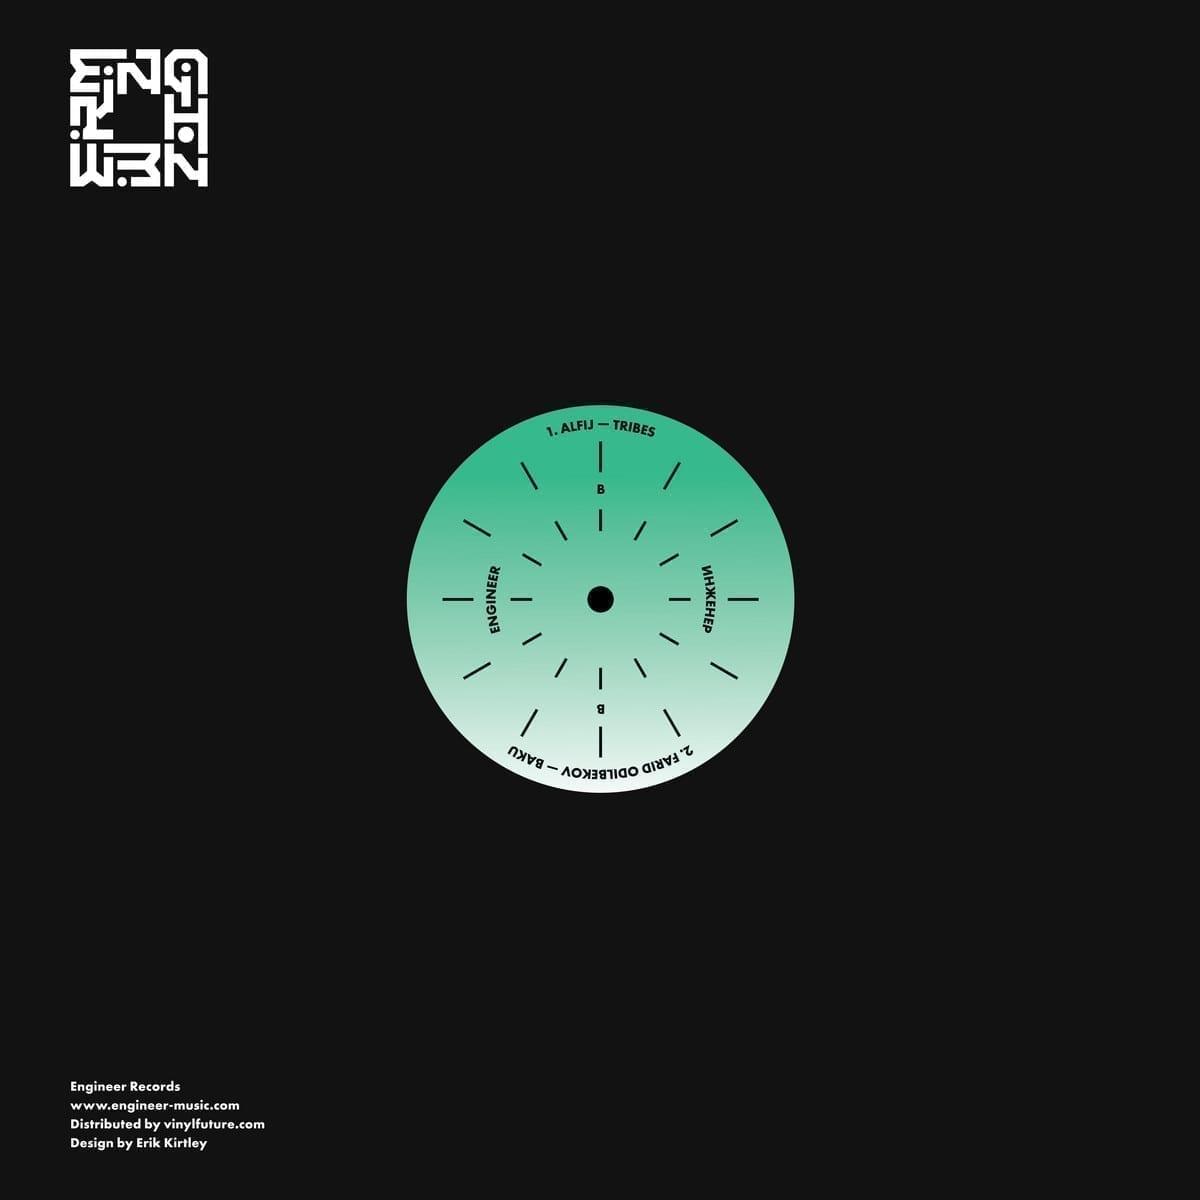 Wyro, Mobile Soul System, Alfij, Farid Odilbekov - Juliemadiscake [Engineer Records] back